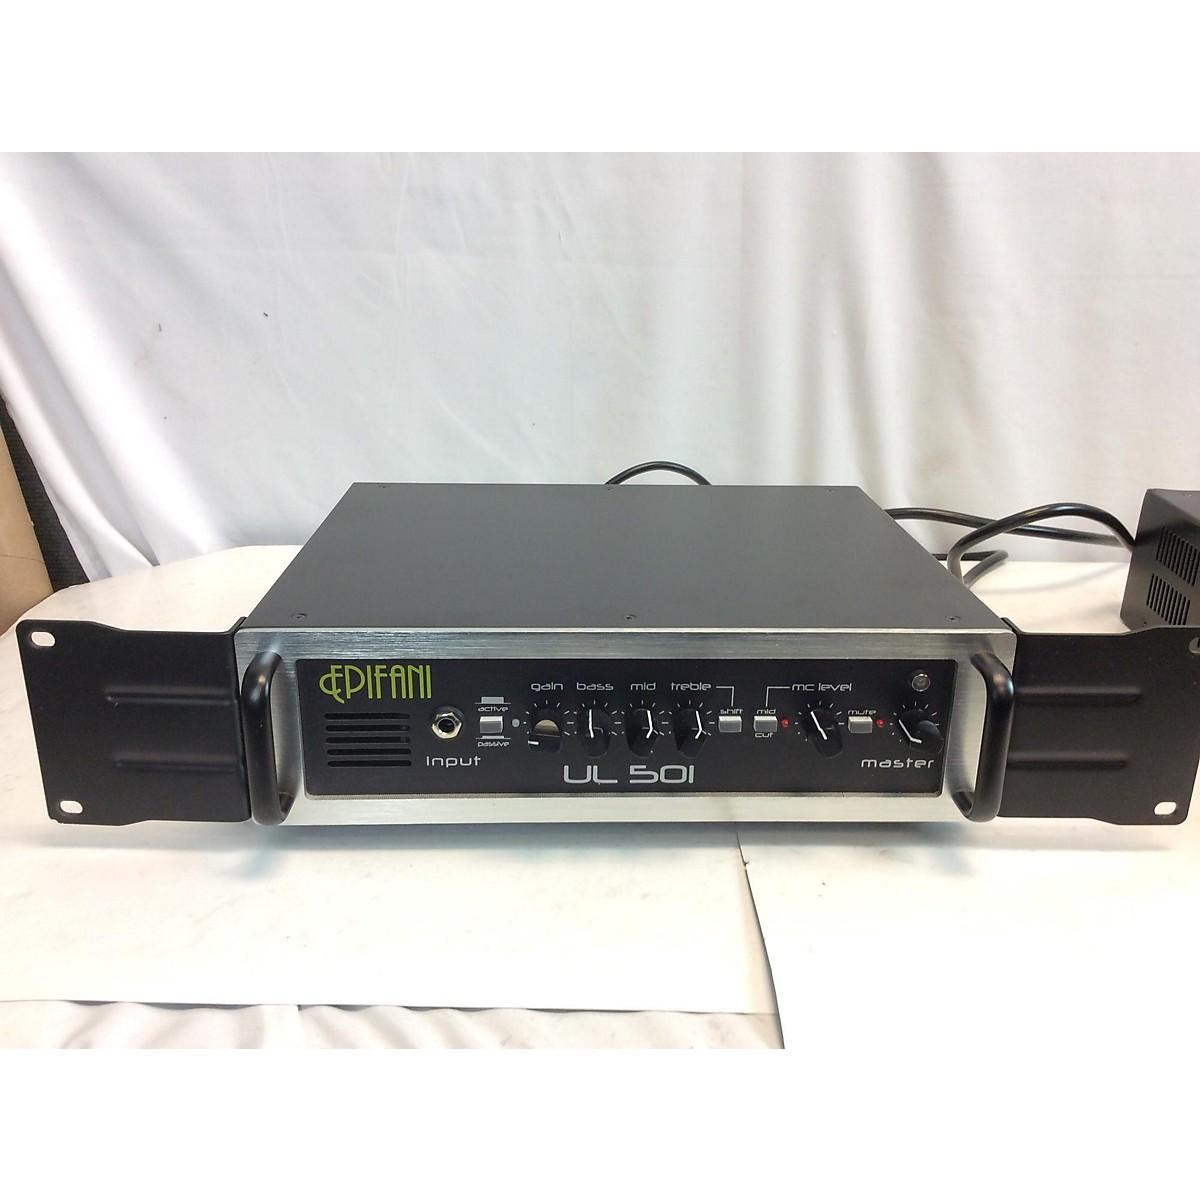 Epifani UL501 800W Bass Amp Head